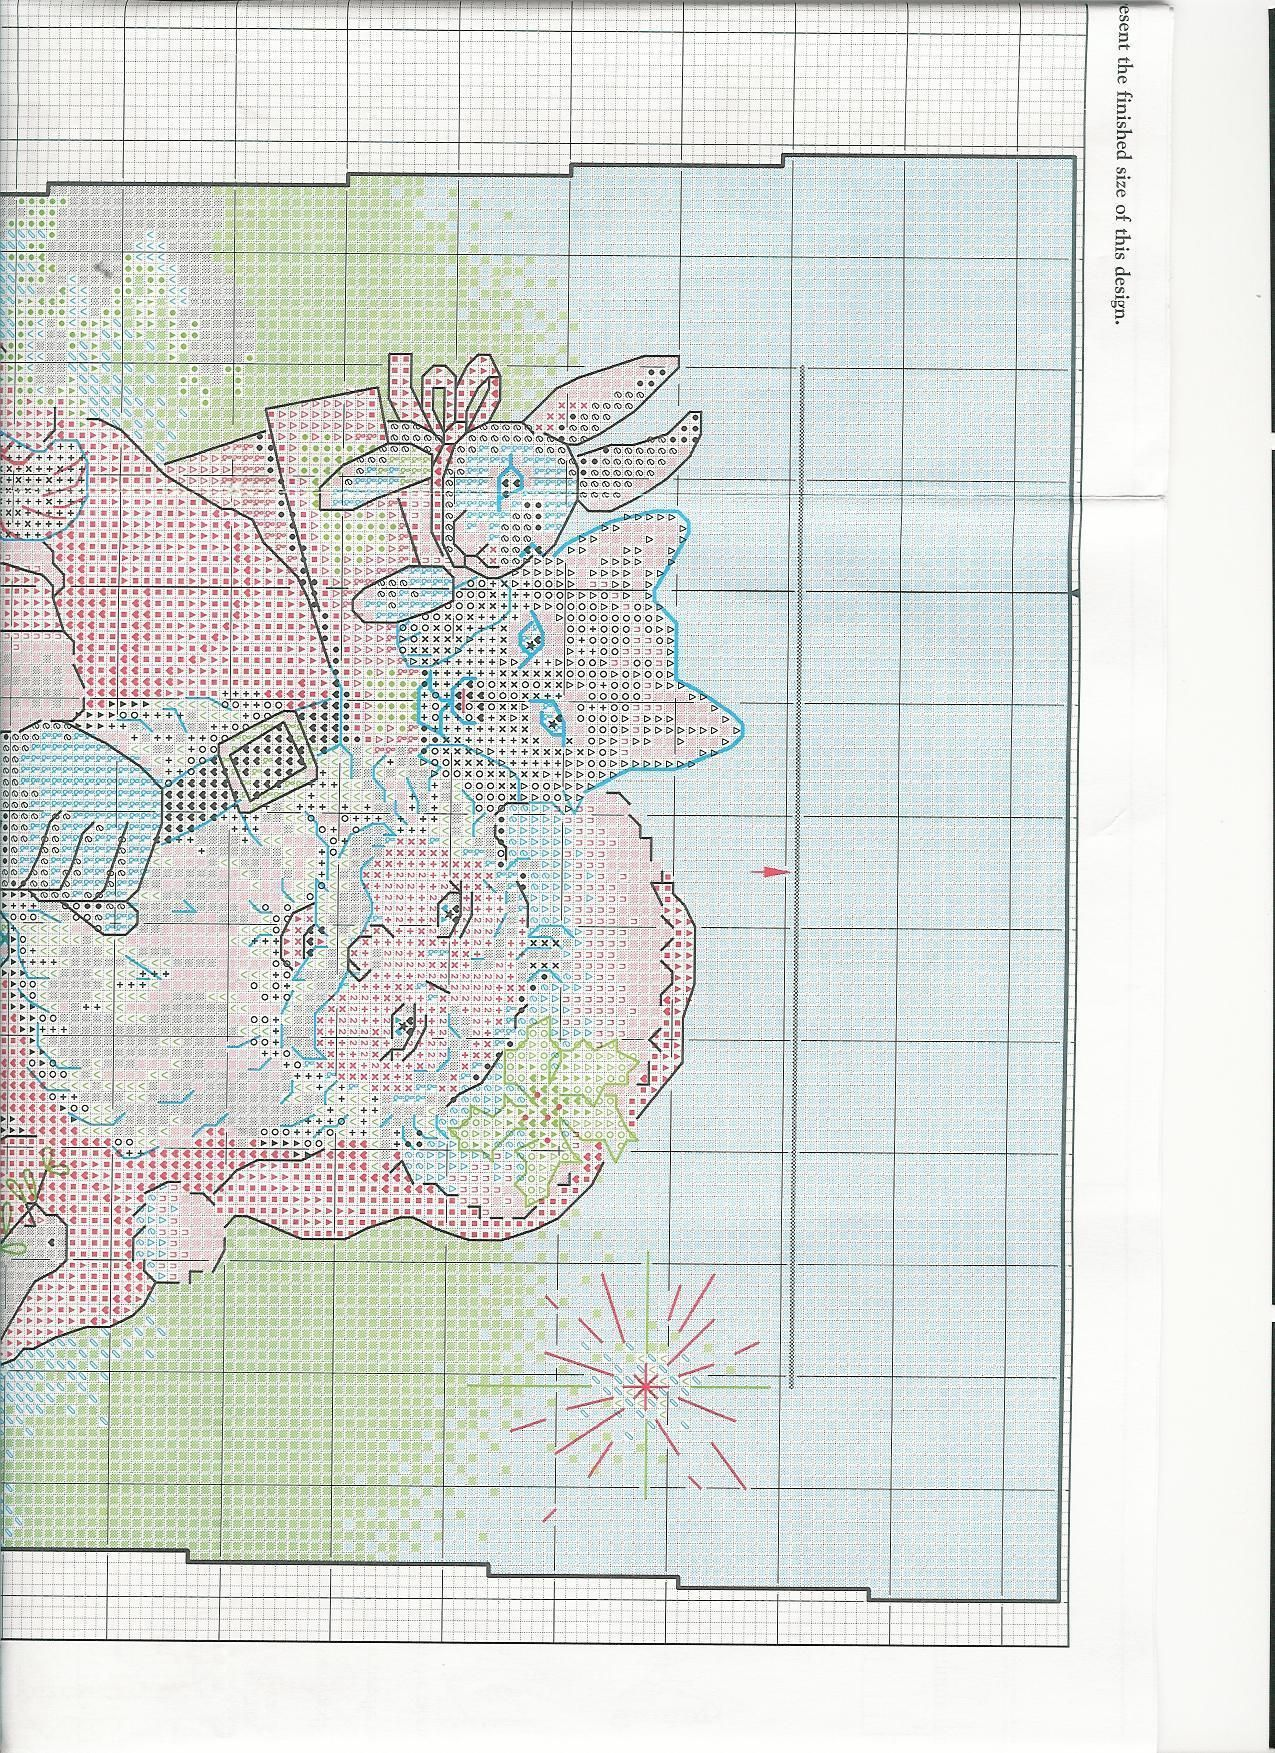 Calza Babbonatale 12b | CROSS STITCH CHRISTMAS 2 | Pinterest | Calzas